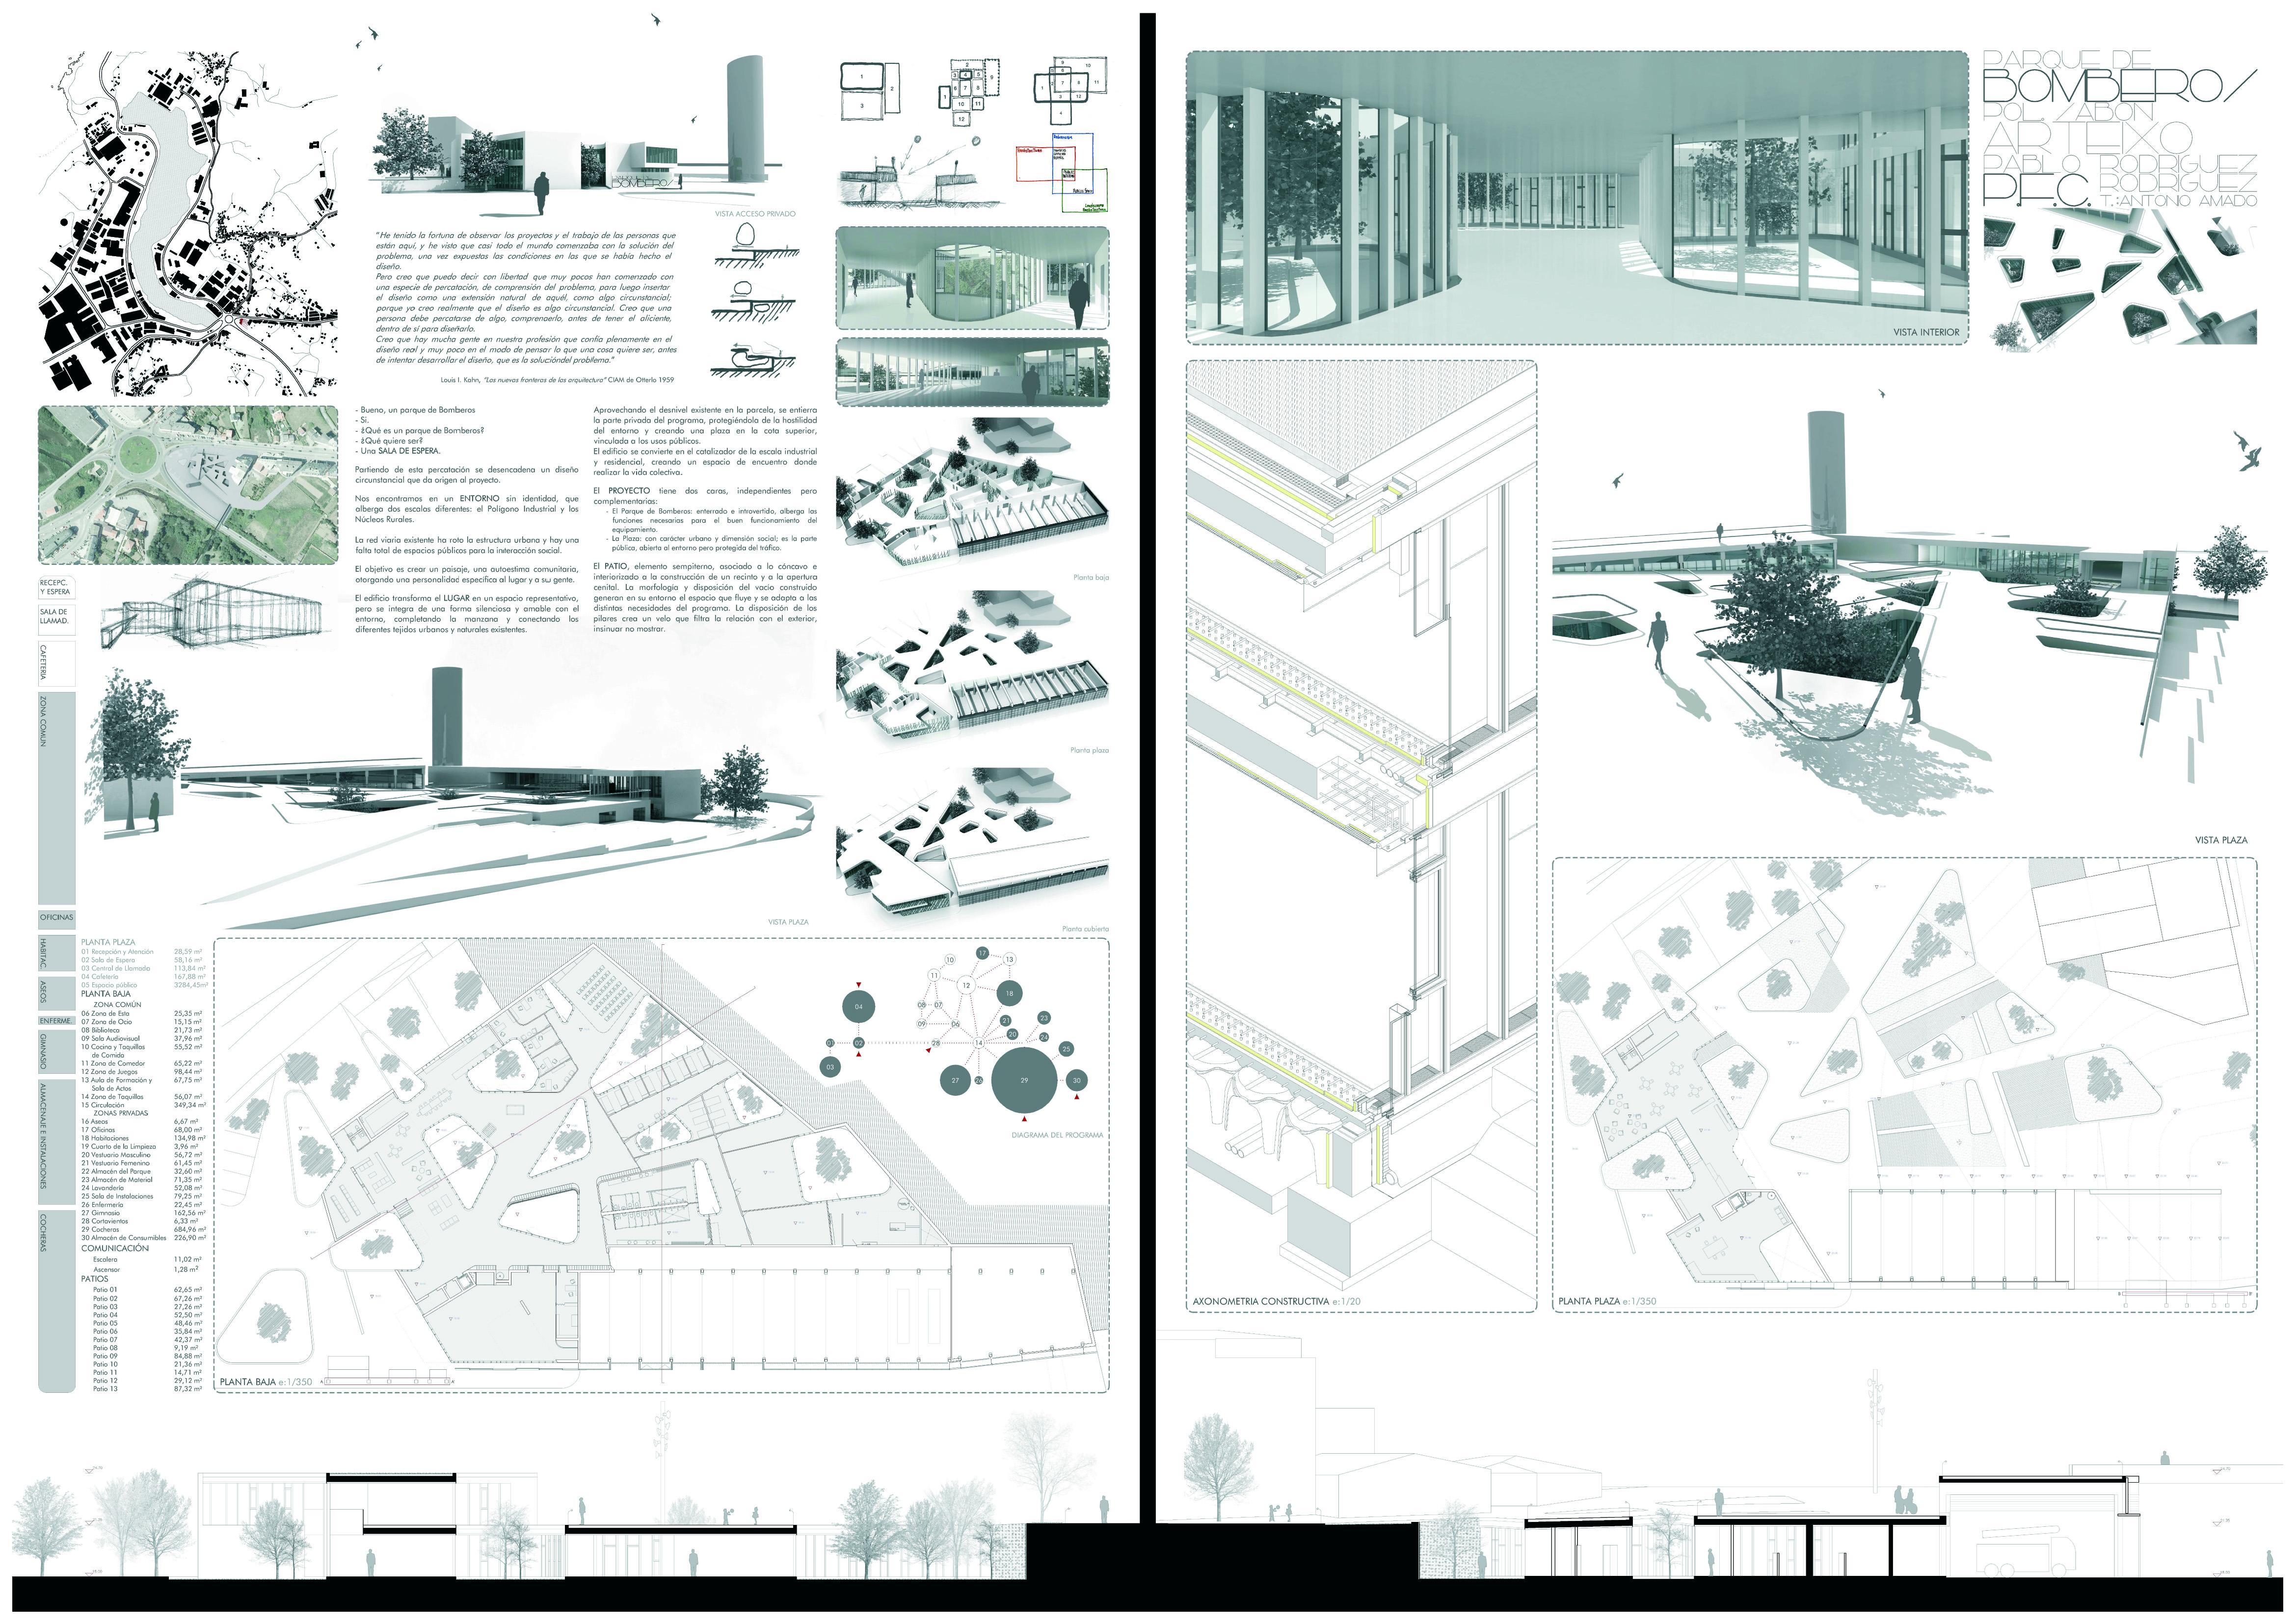 Prize thesis competition 2012 tvarquitectura for Carrera de arquitectura